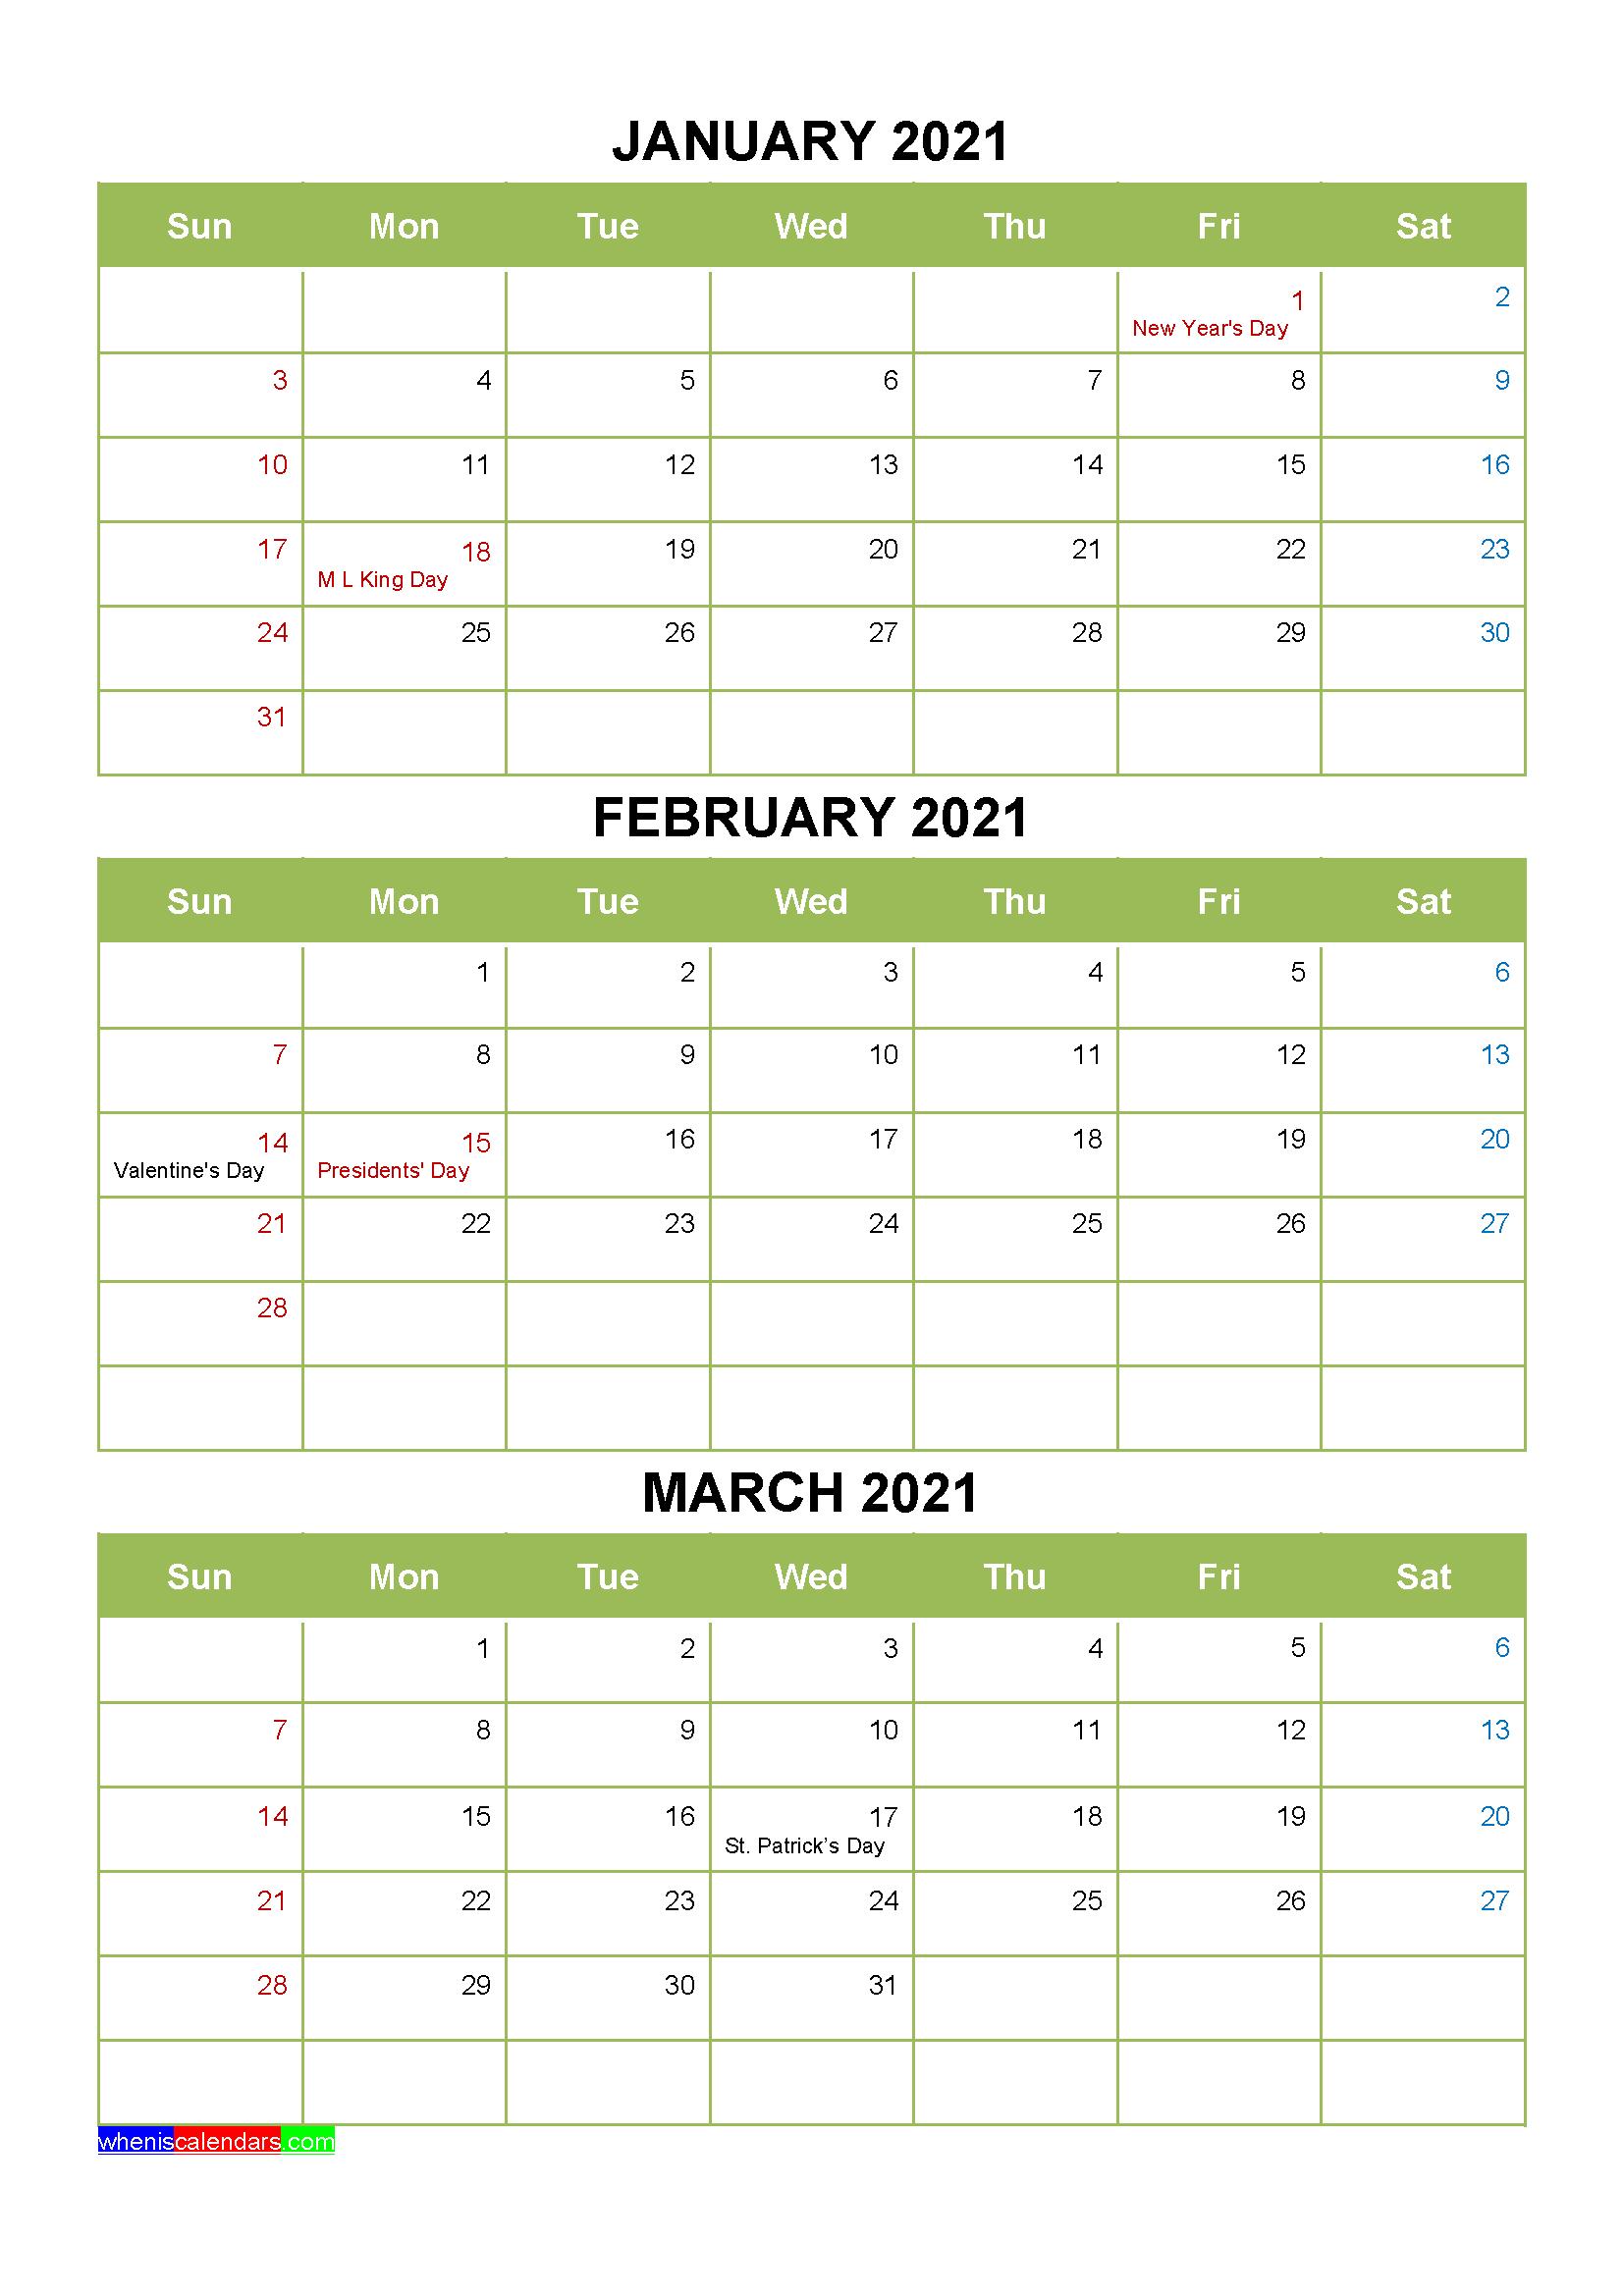 Free Printable January February March 2021 Calendar 3 ...